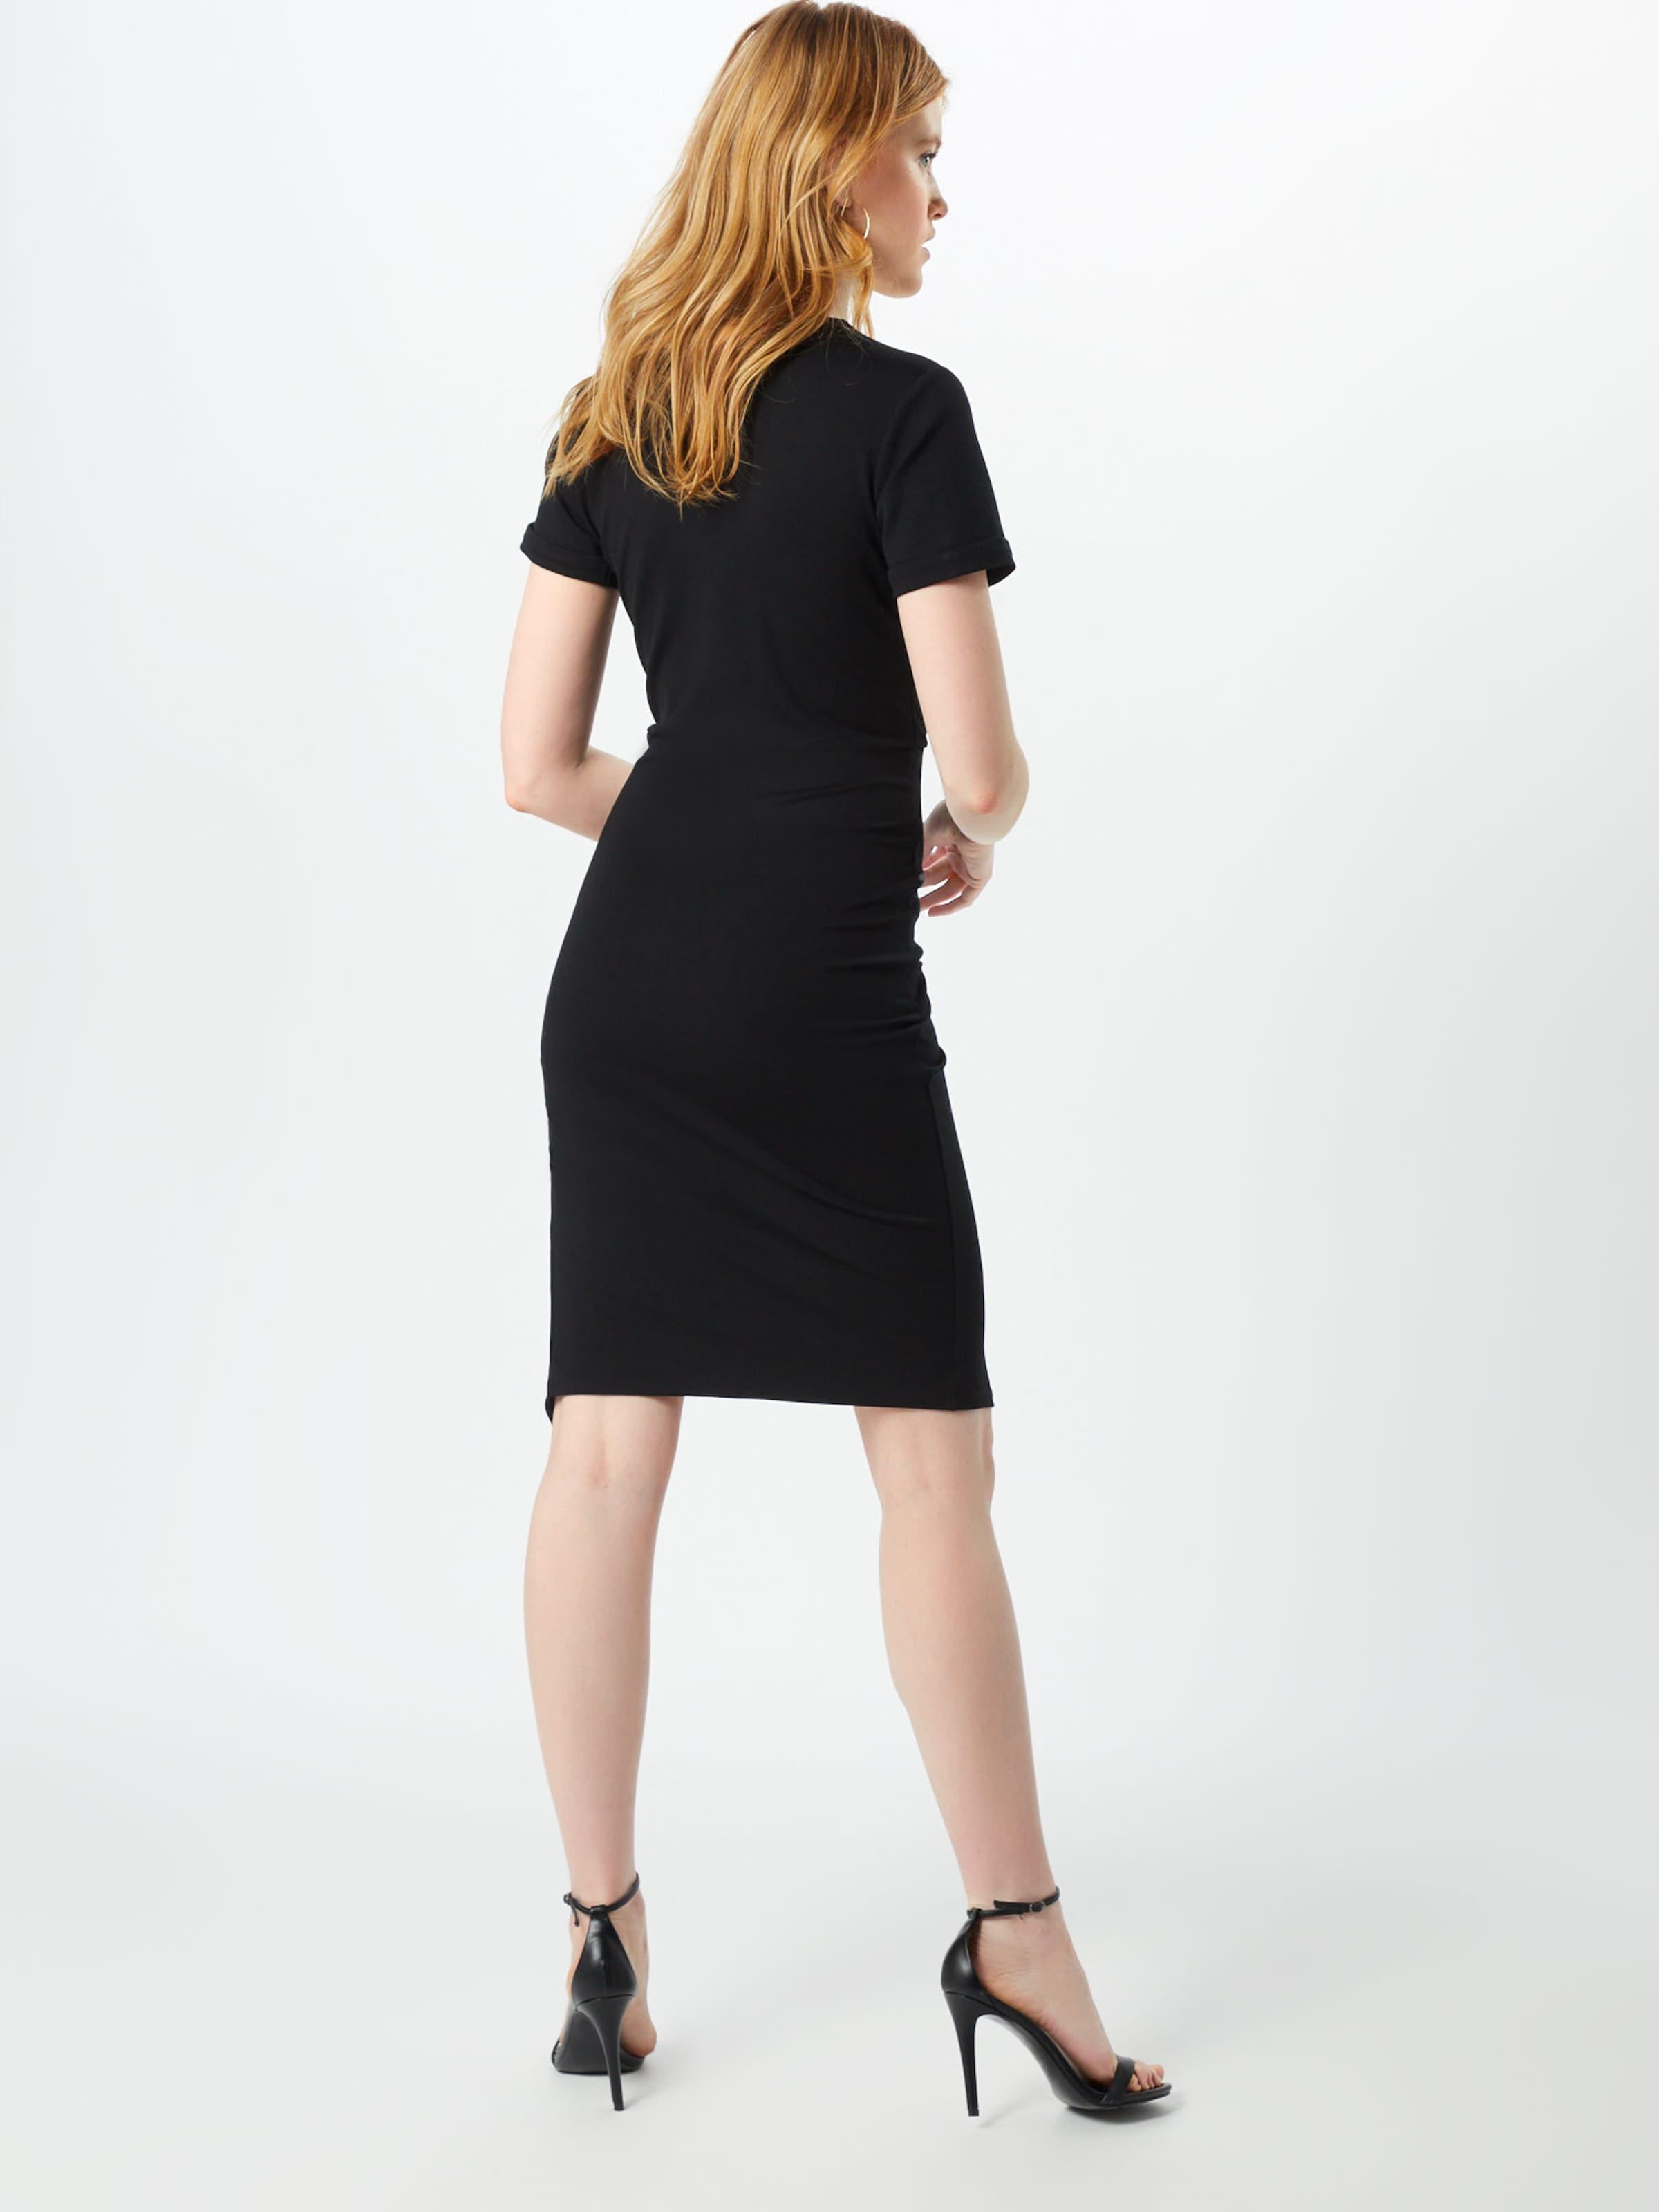 In Schwarz In Schwarz Kleid Kleid Kleid In Schwarz Ivyrevel Ivyrevel Ivyrevel Y7gybf6